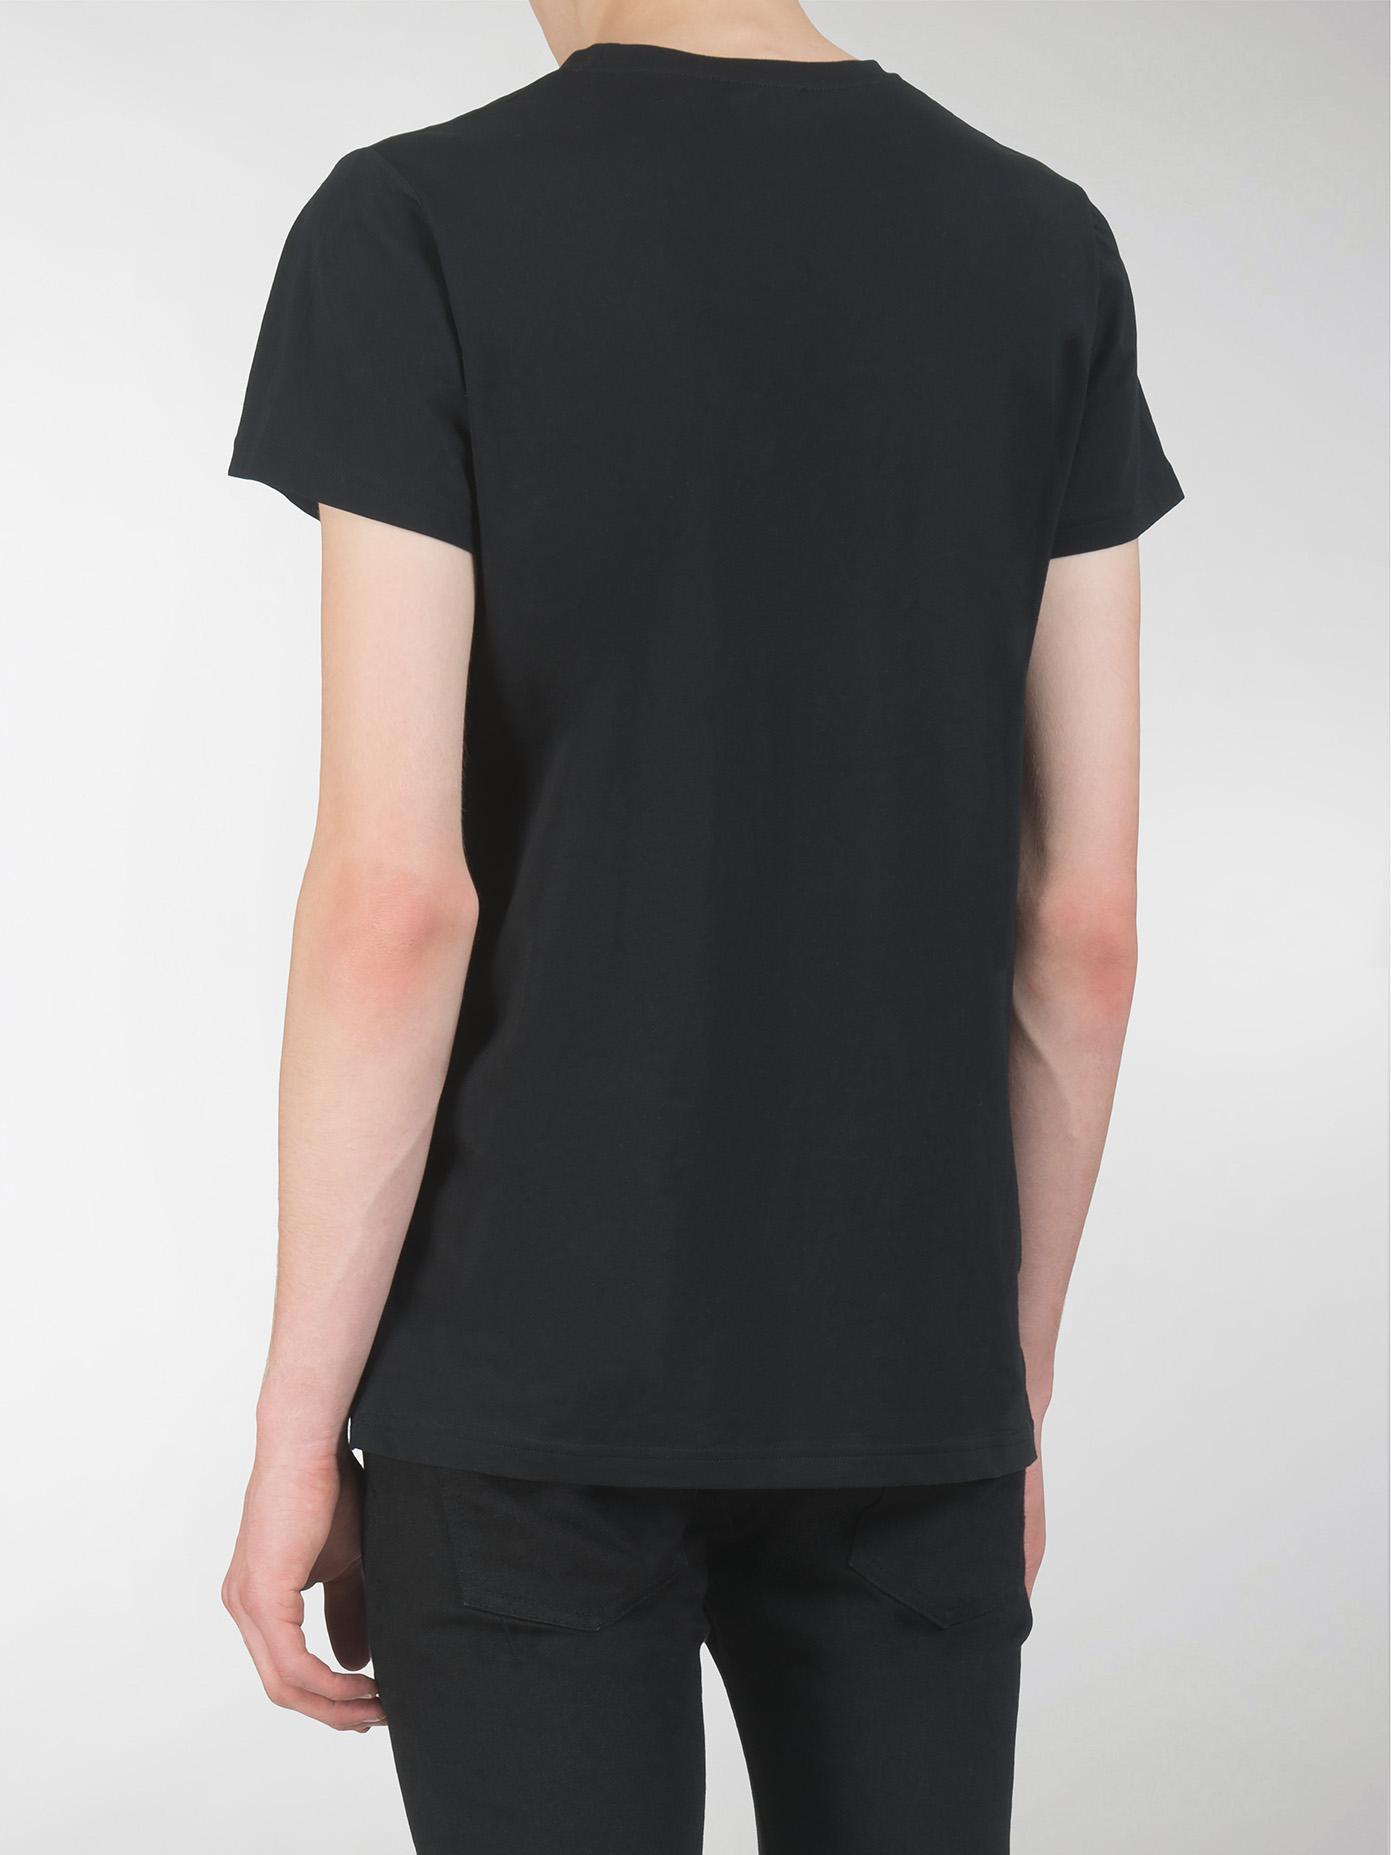 balmain tshirt blanc print paris noir in black for men lyst. Black Bedroom Furniture Sets. Home Design Ideas